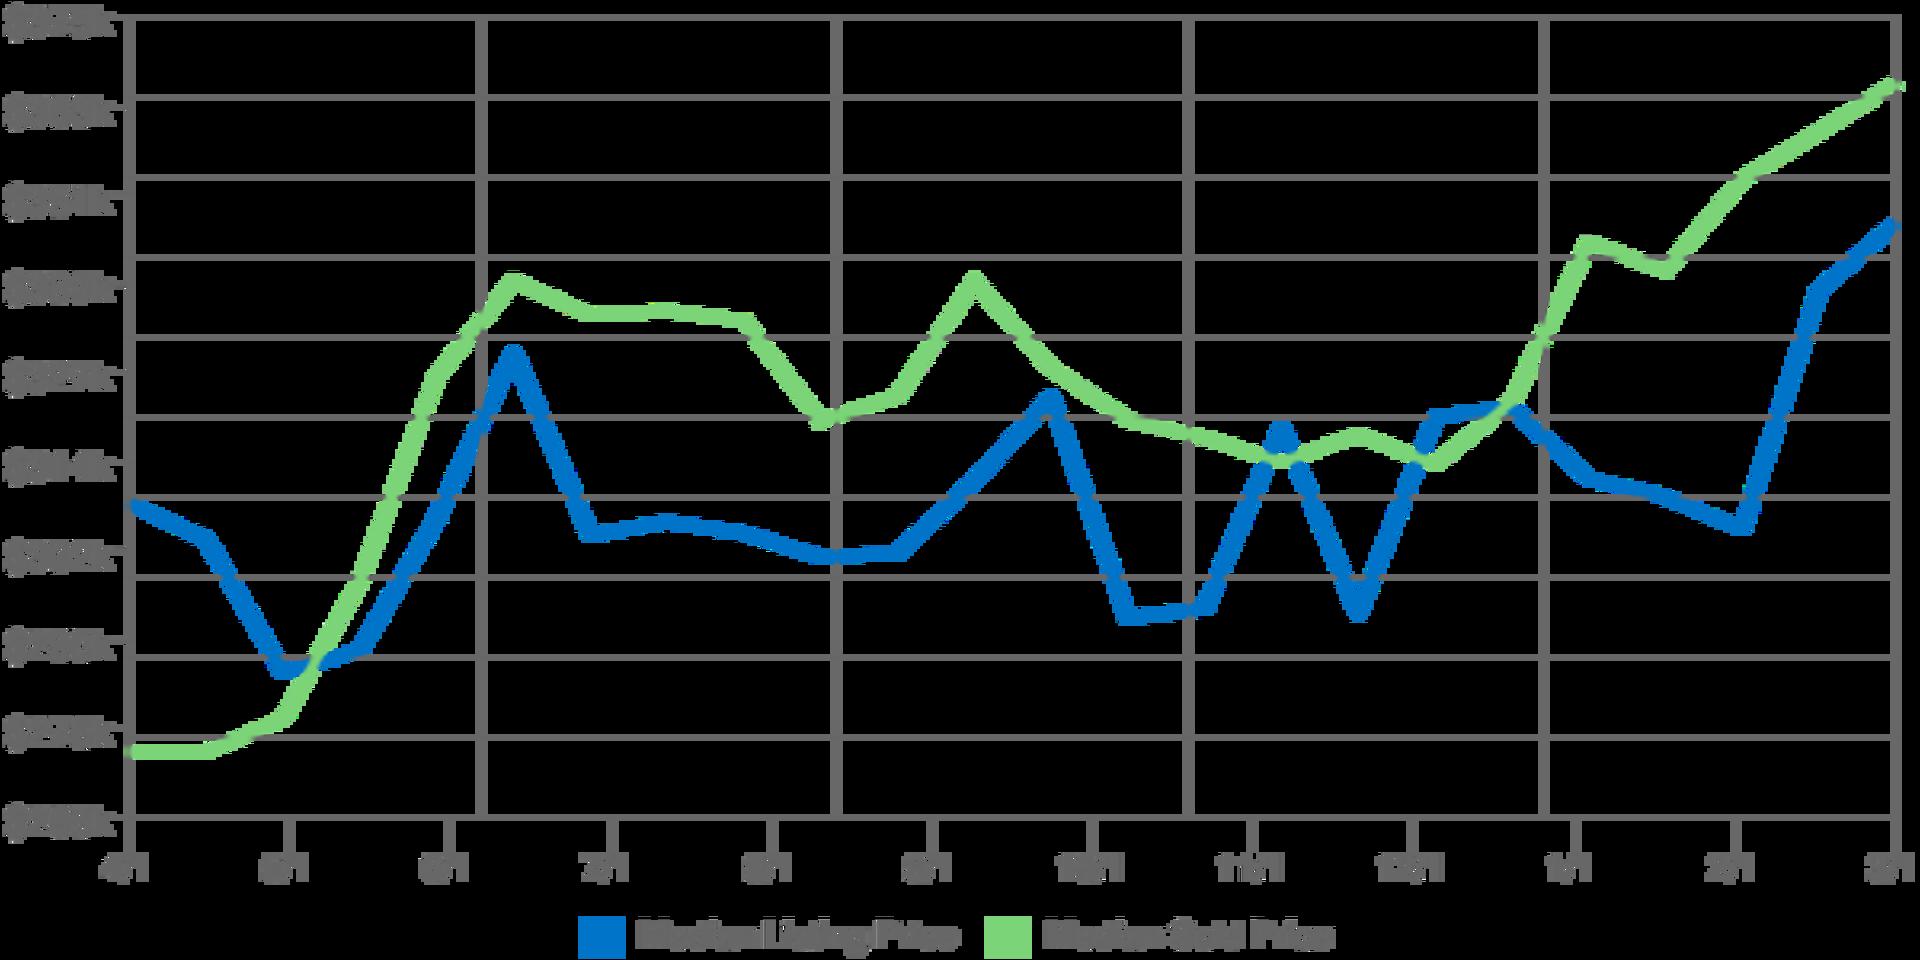 Home Prices in Kodiak Alaska for March 2017